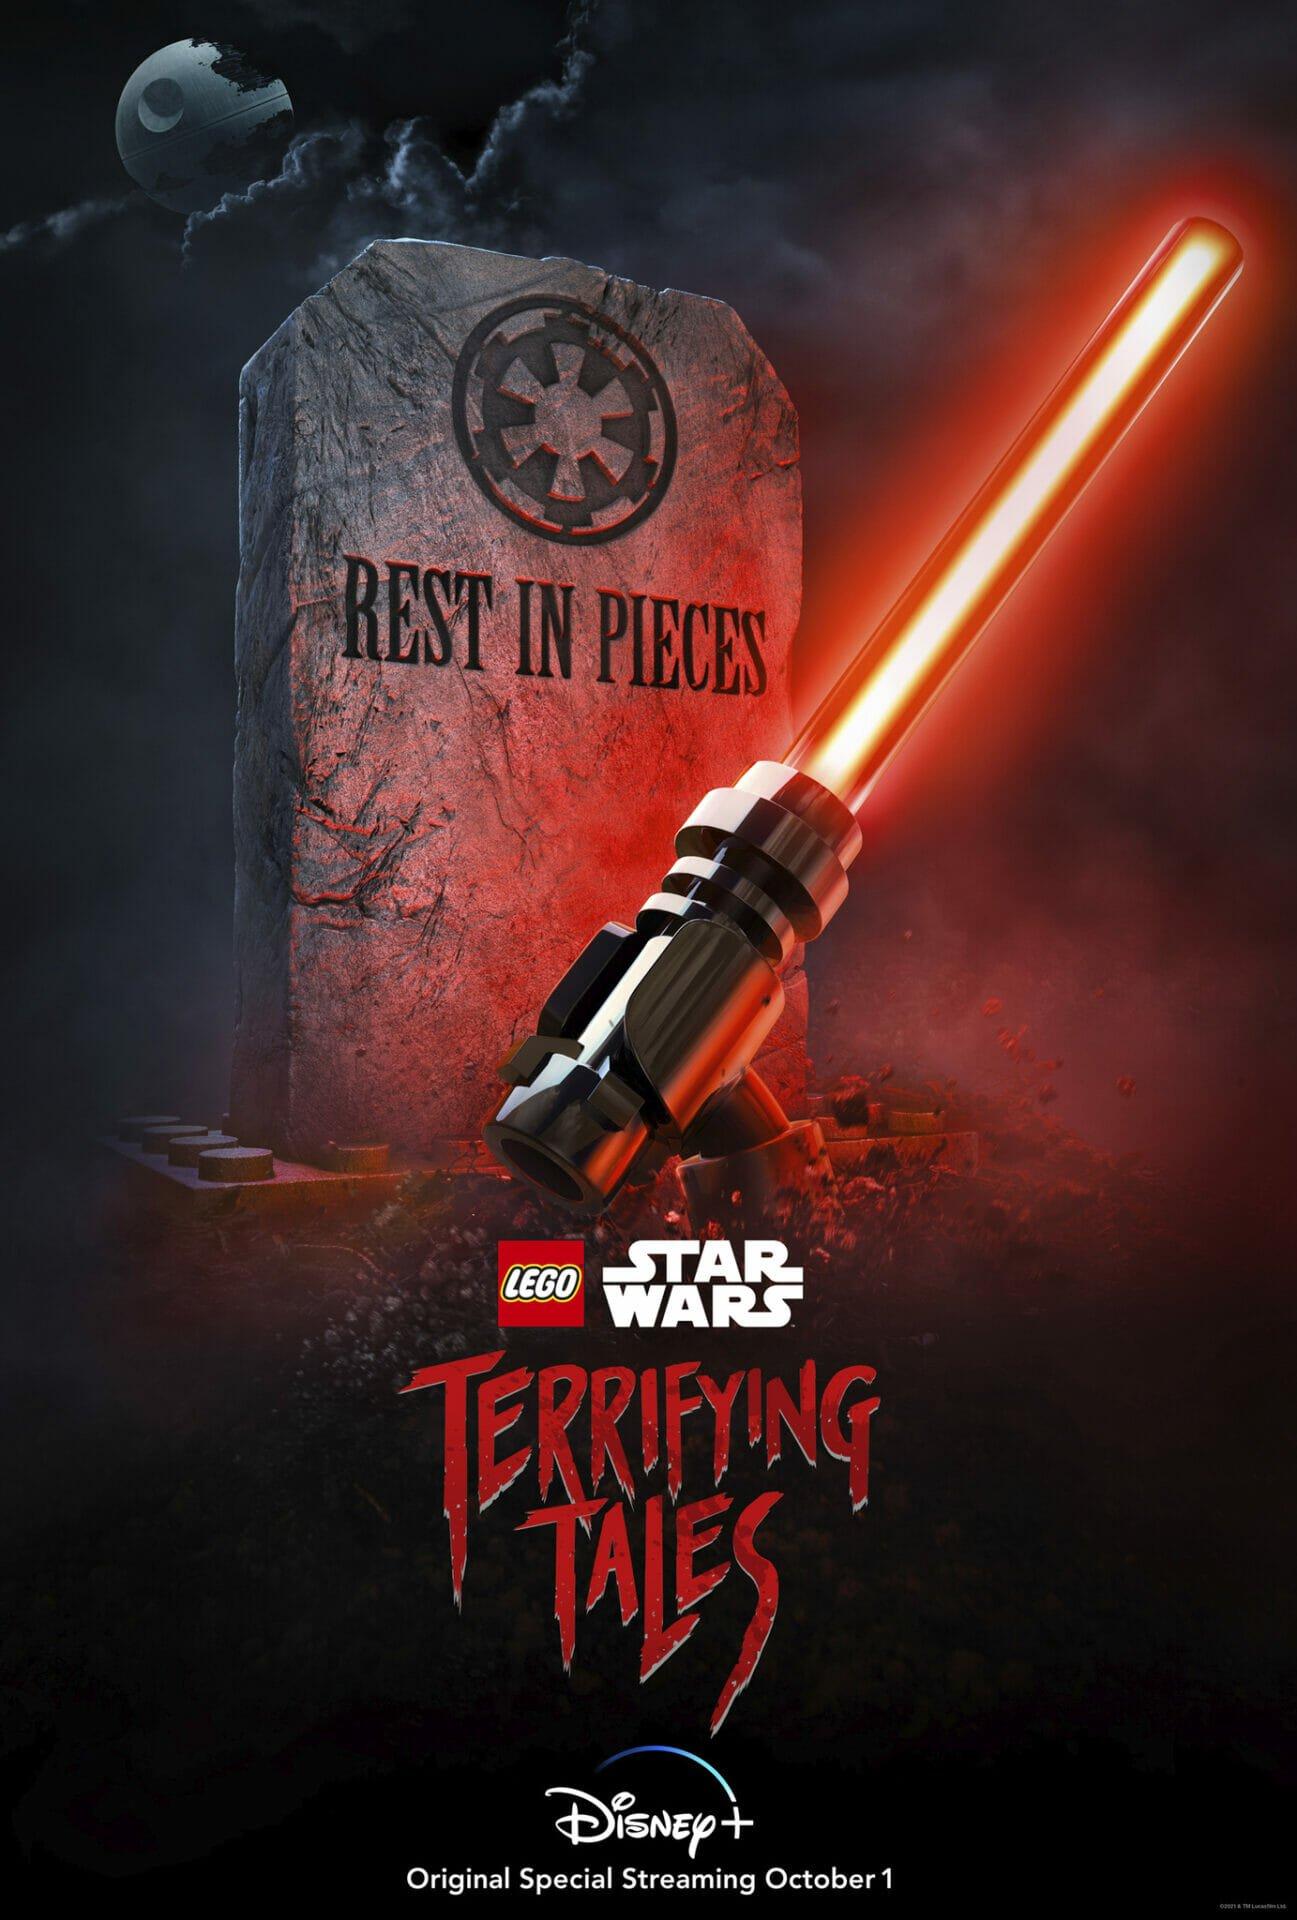 Lego Star Wars Returns With Dark Side Terrifying Tales